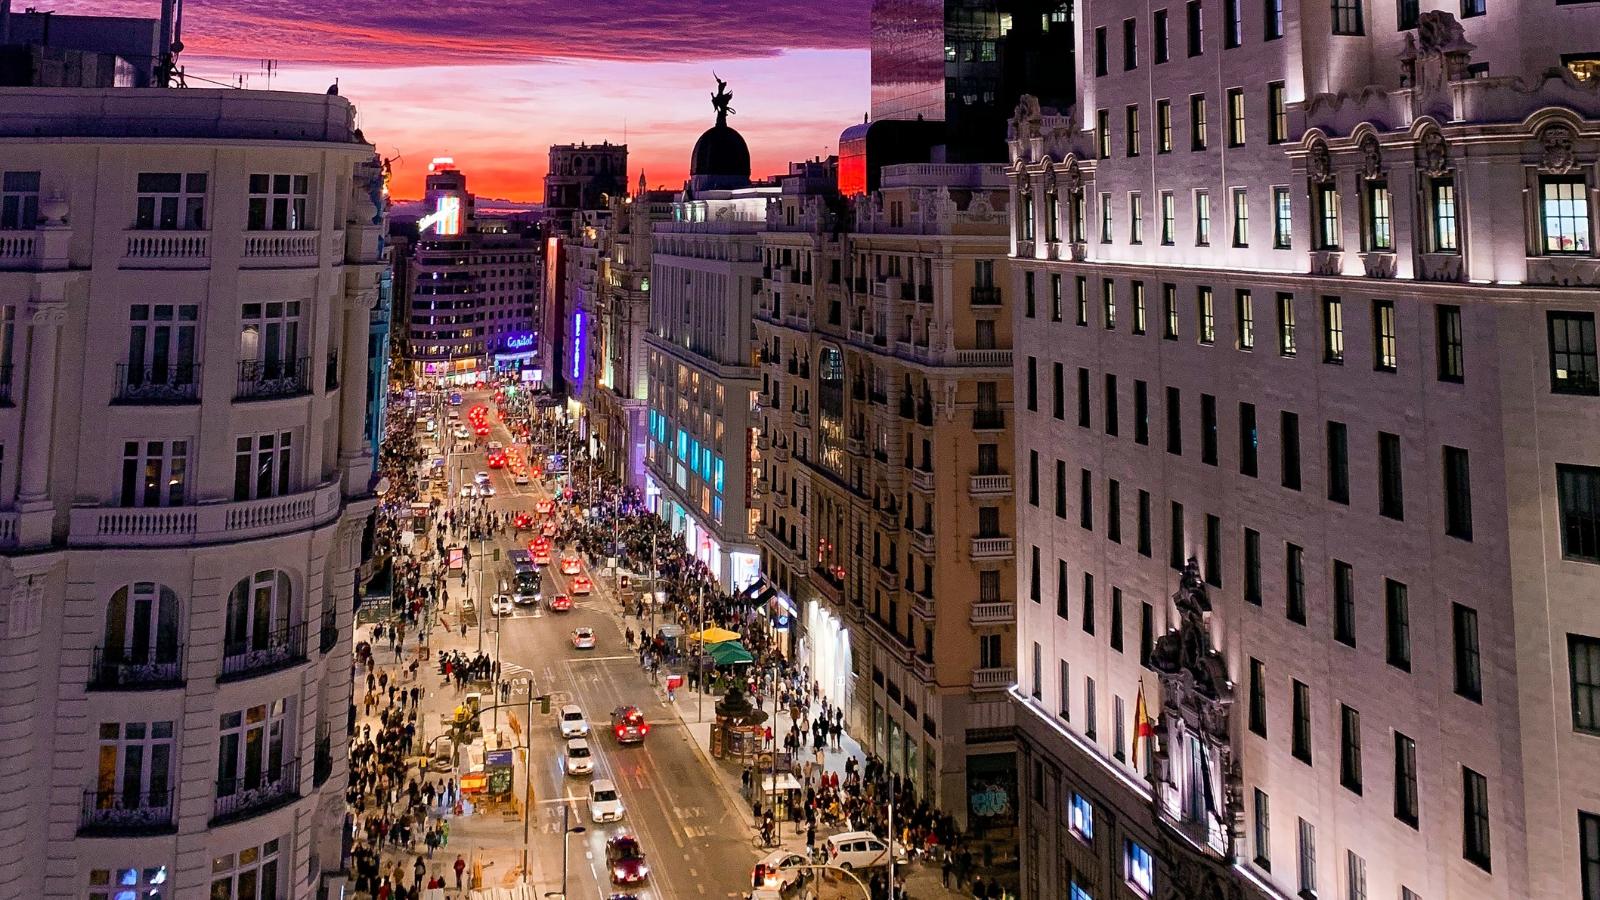 Madrid. Alevision.co/Unsplash